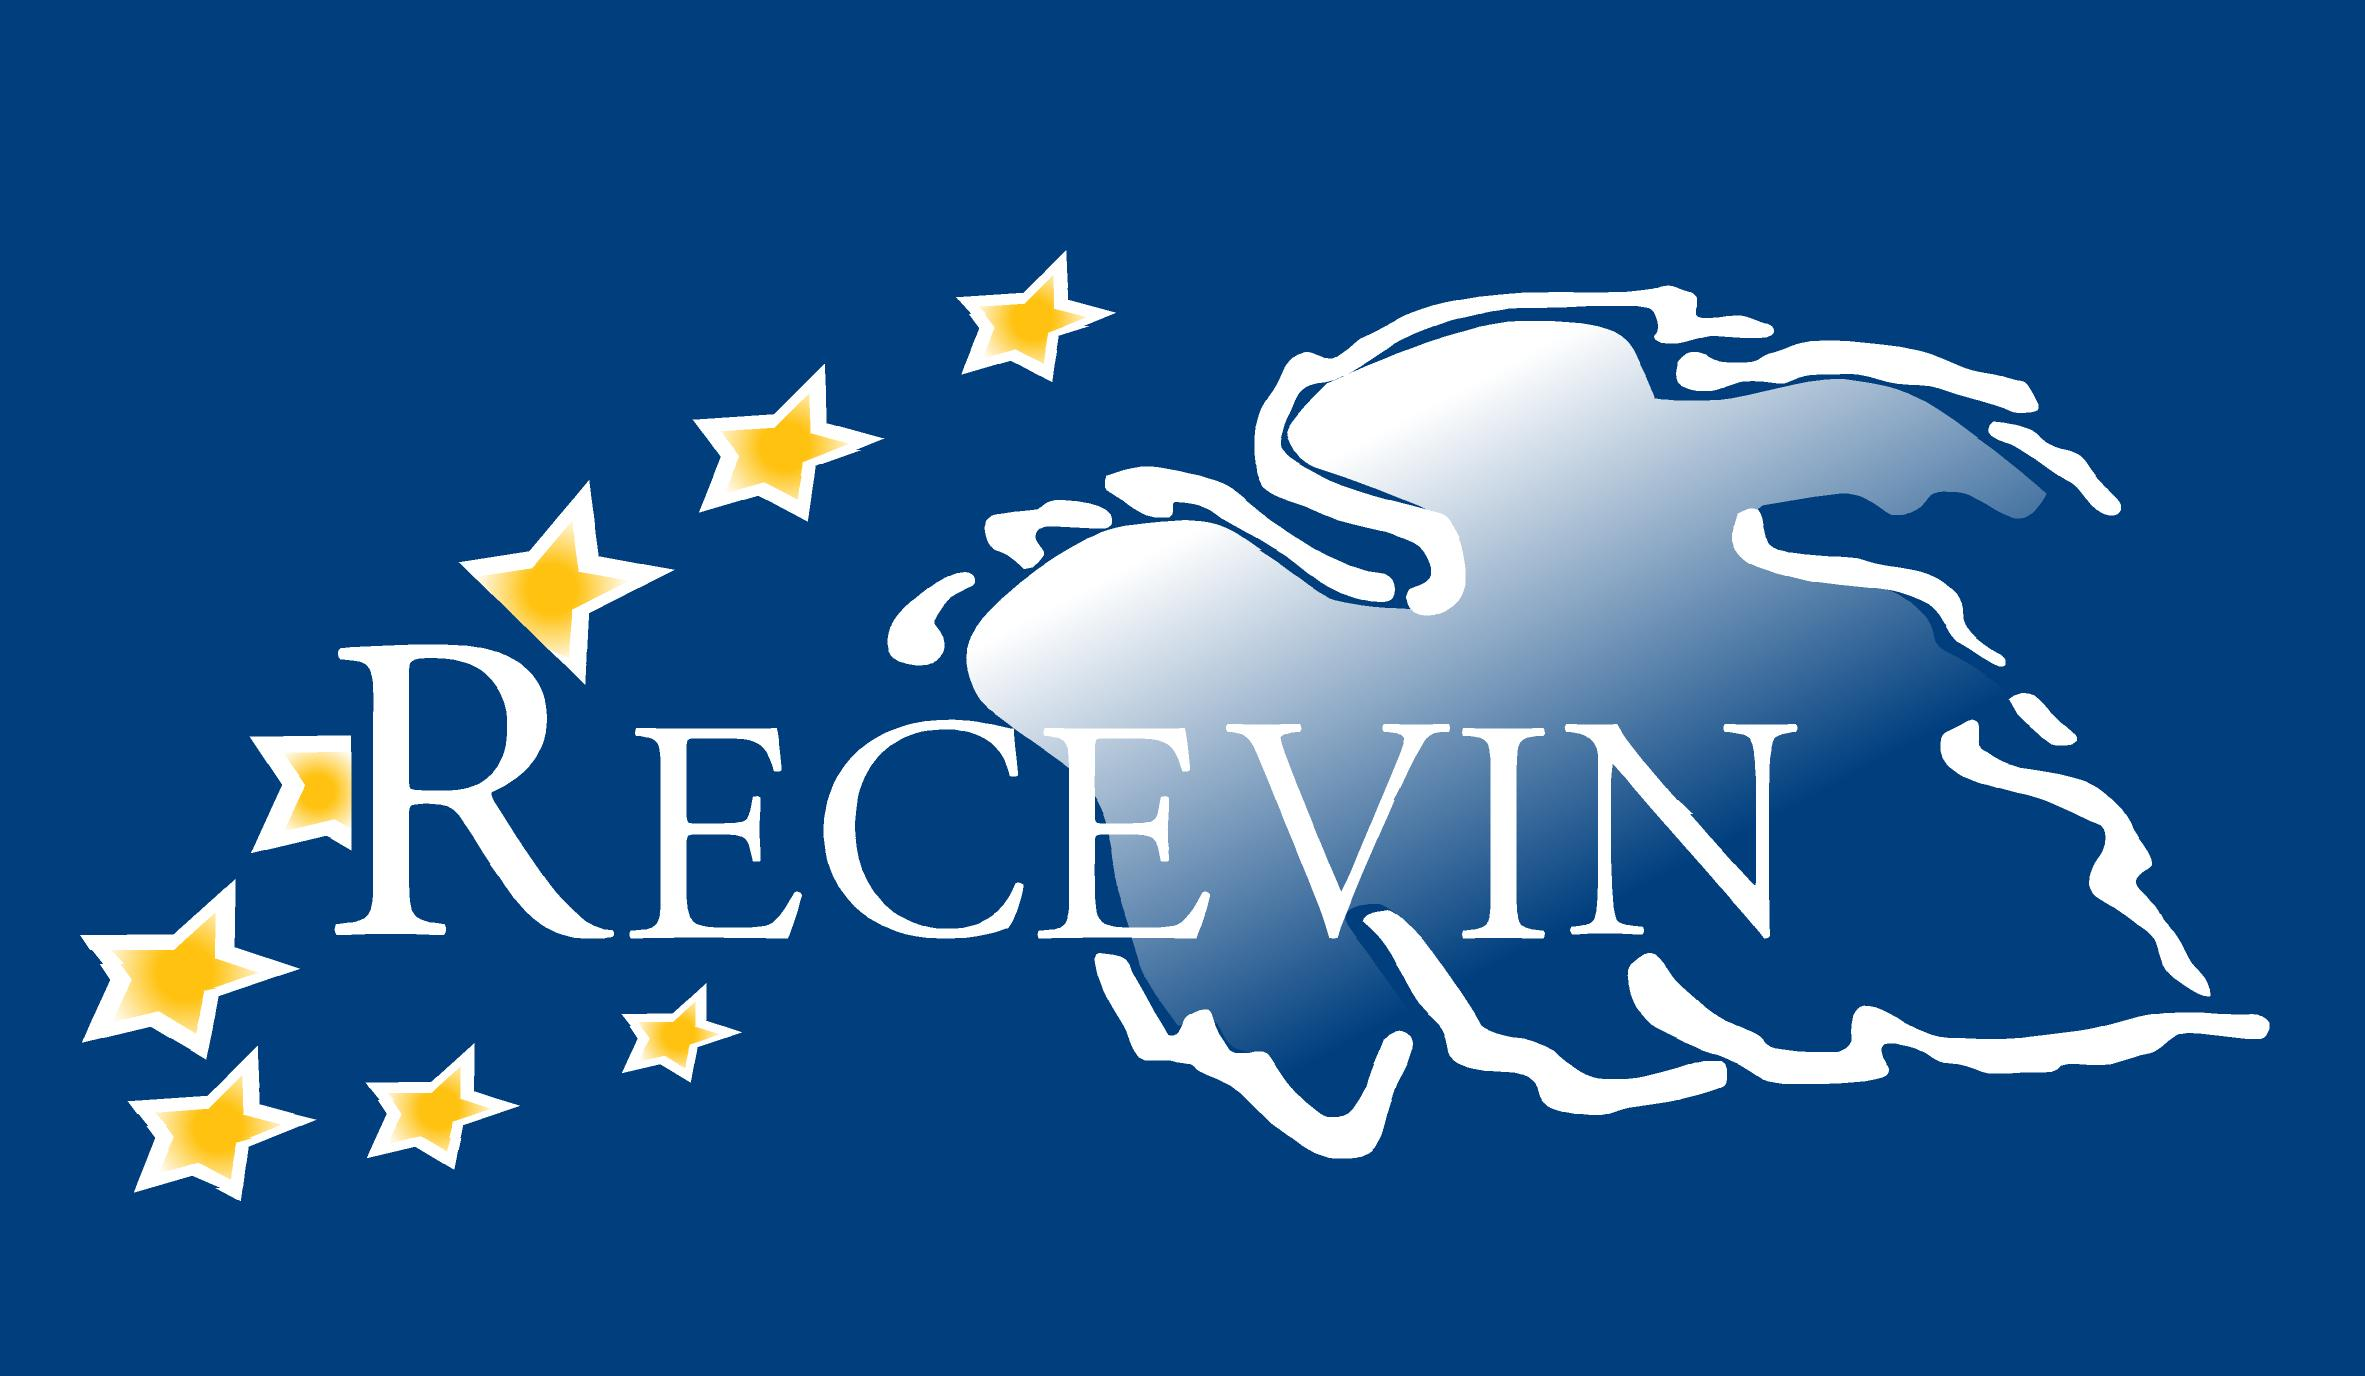 Recevin